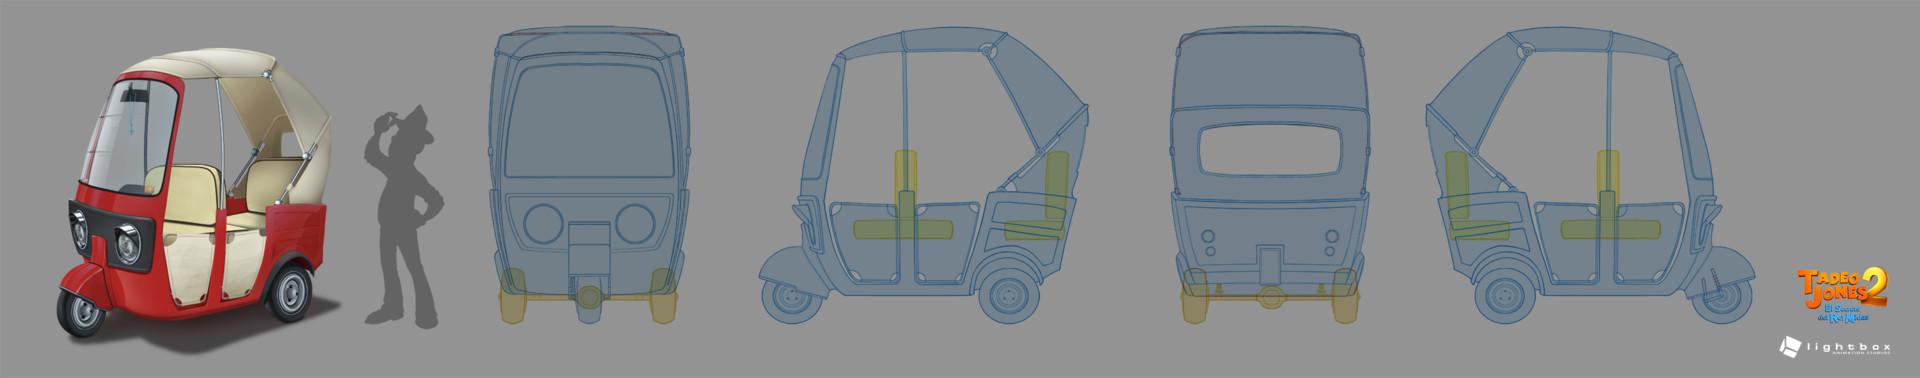 Angel oromendia rickshawblueprintvistas